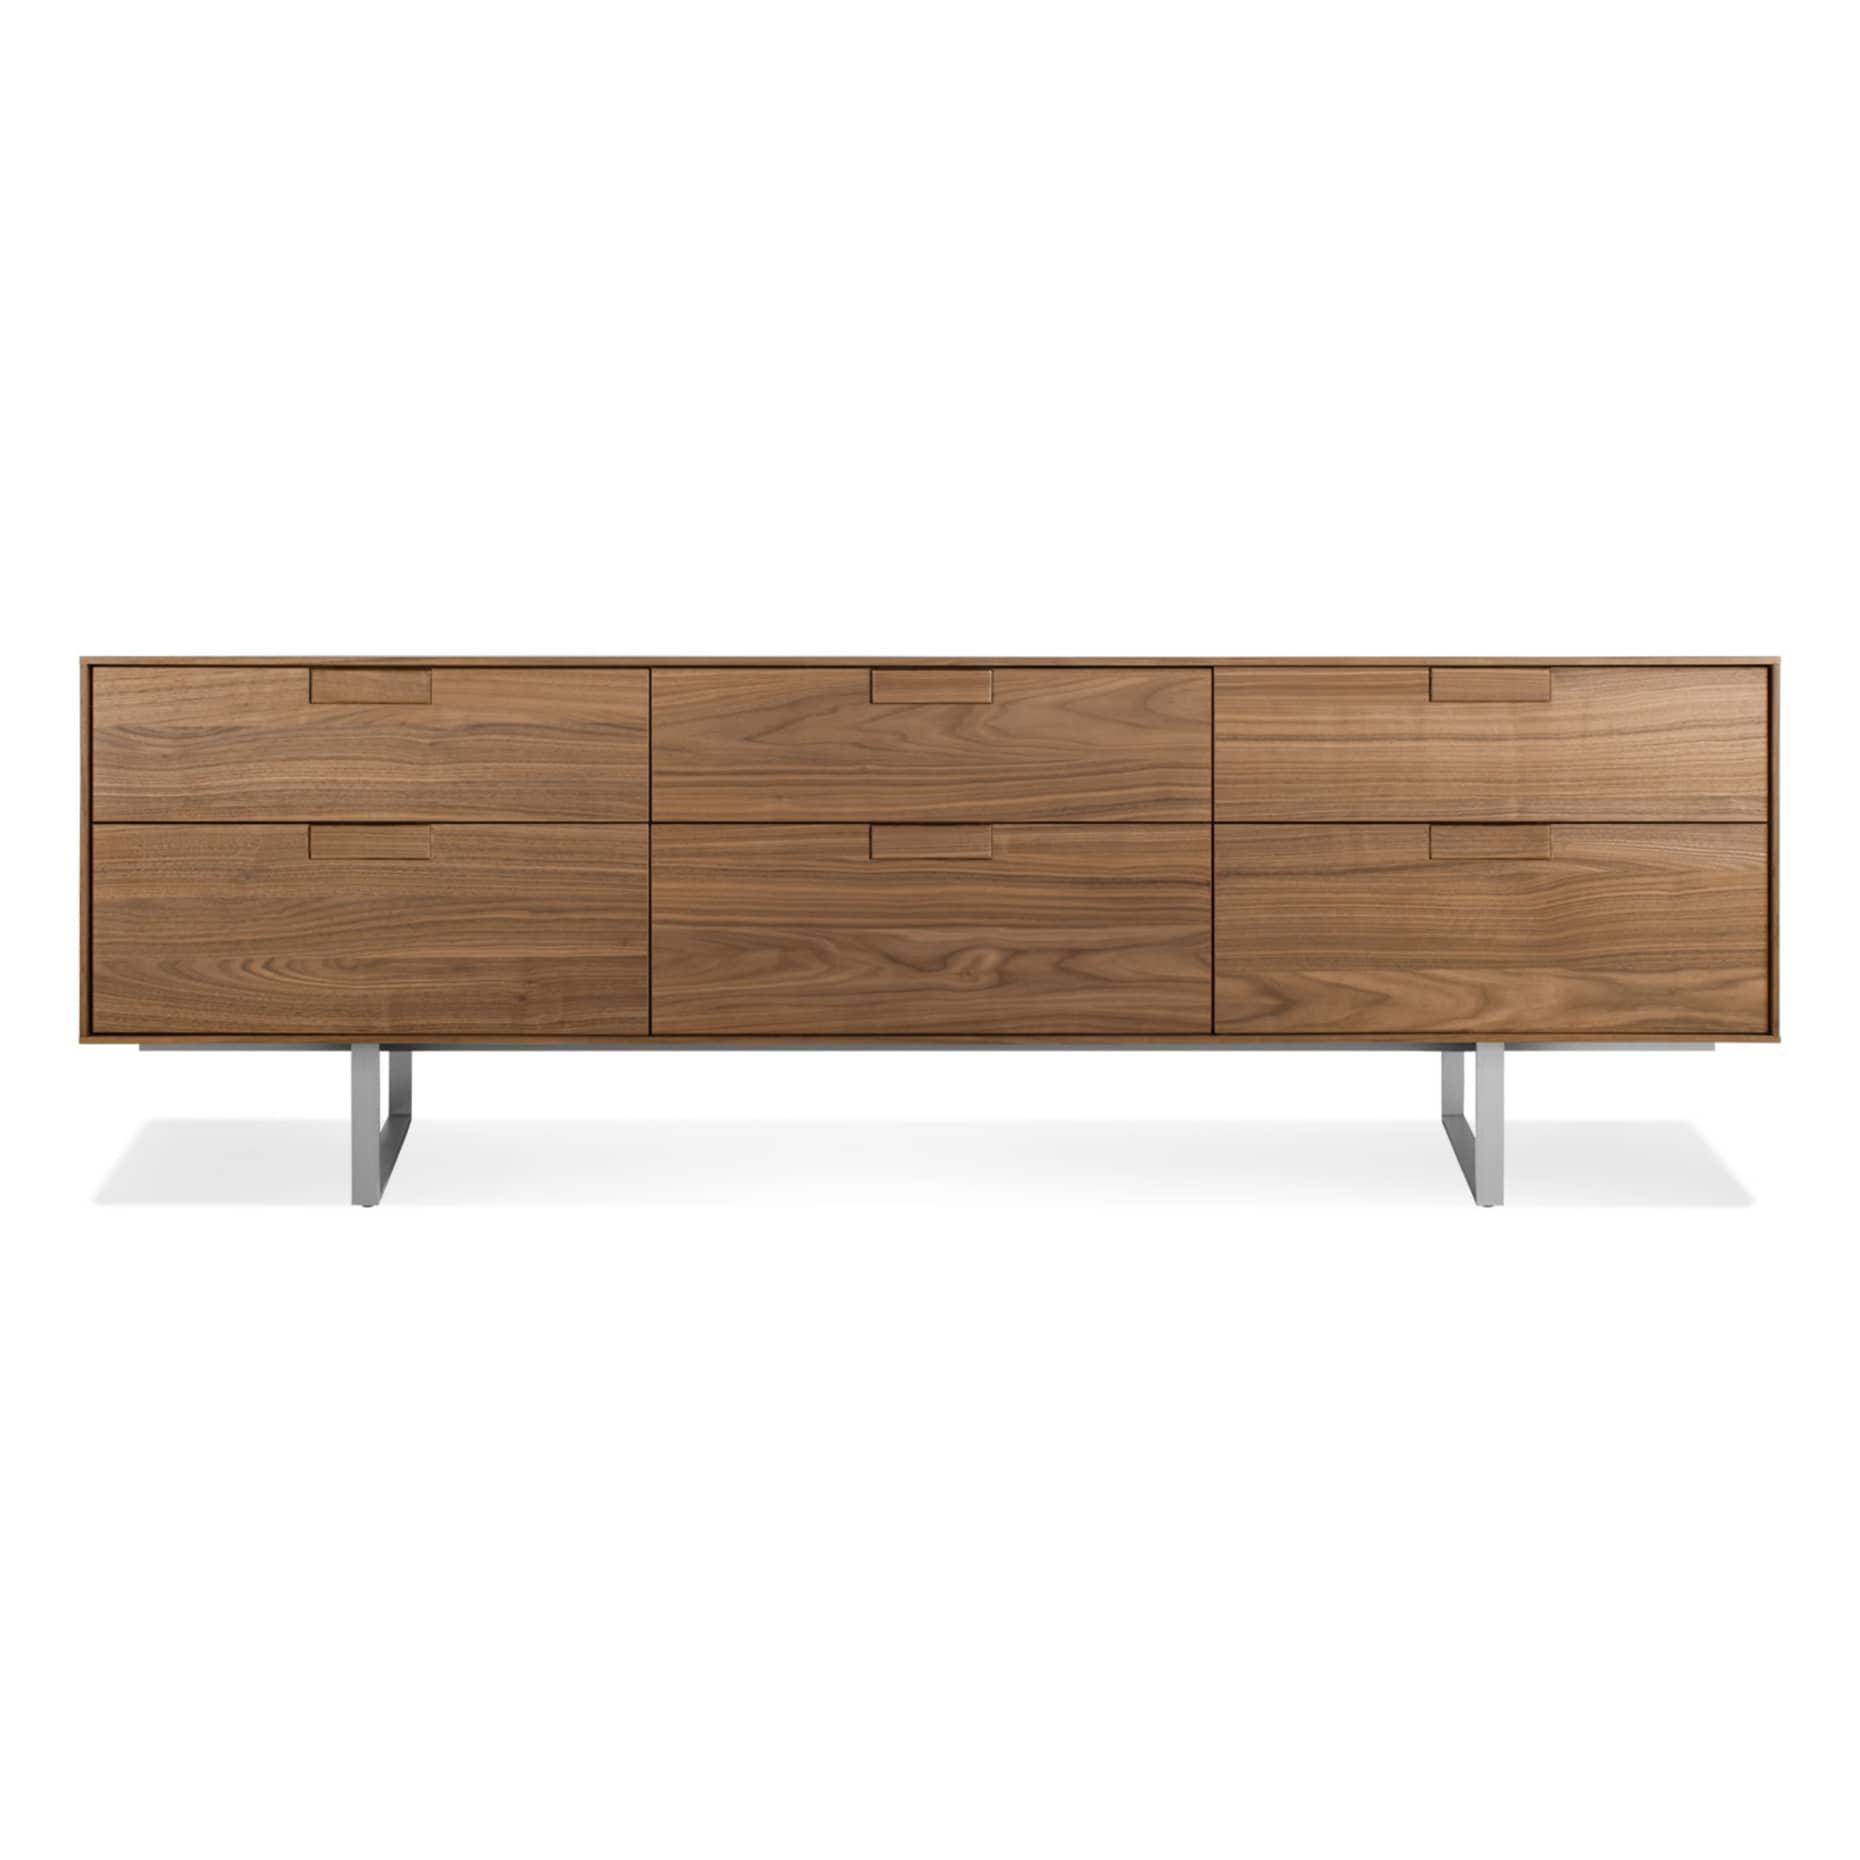 se1 6dwcon wl series 11 6 drawer console walnut